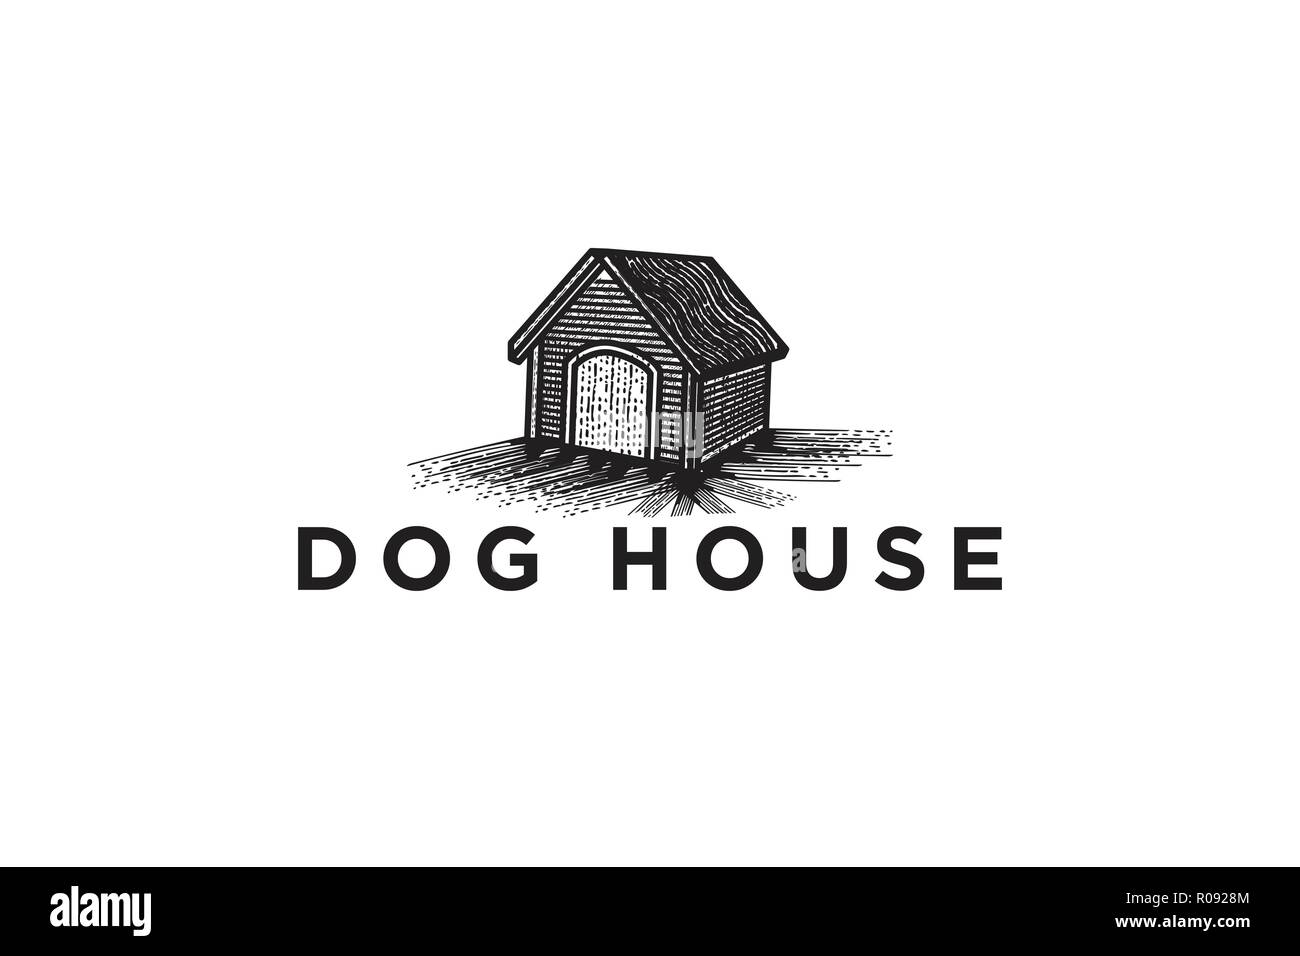 hand drawn dog house logo Designs Inspiration Isolated on White Background - Stock Image